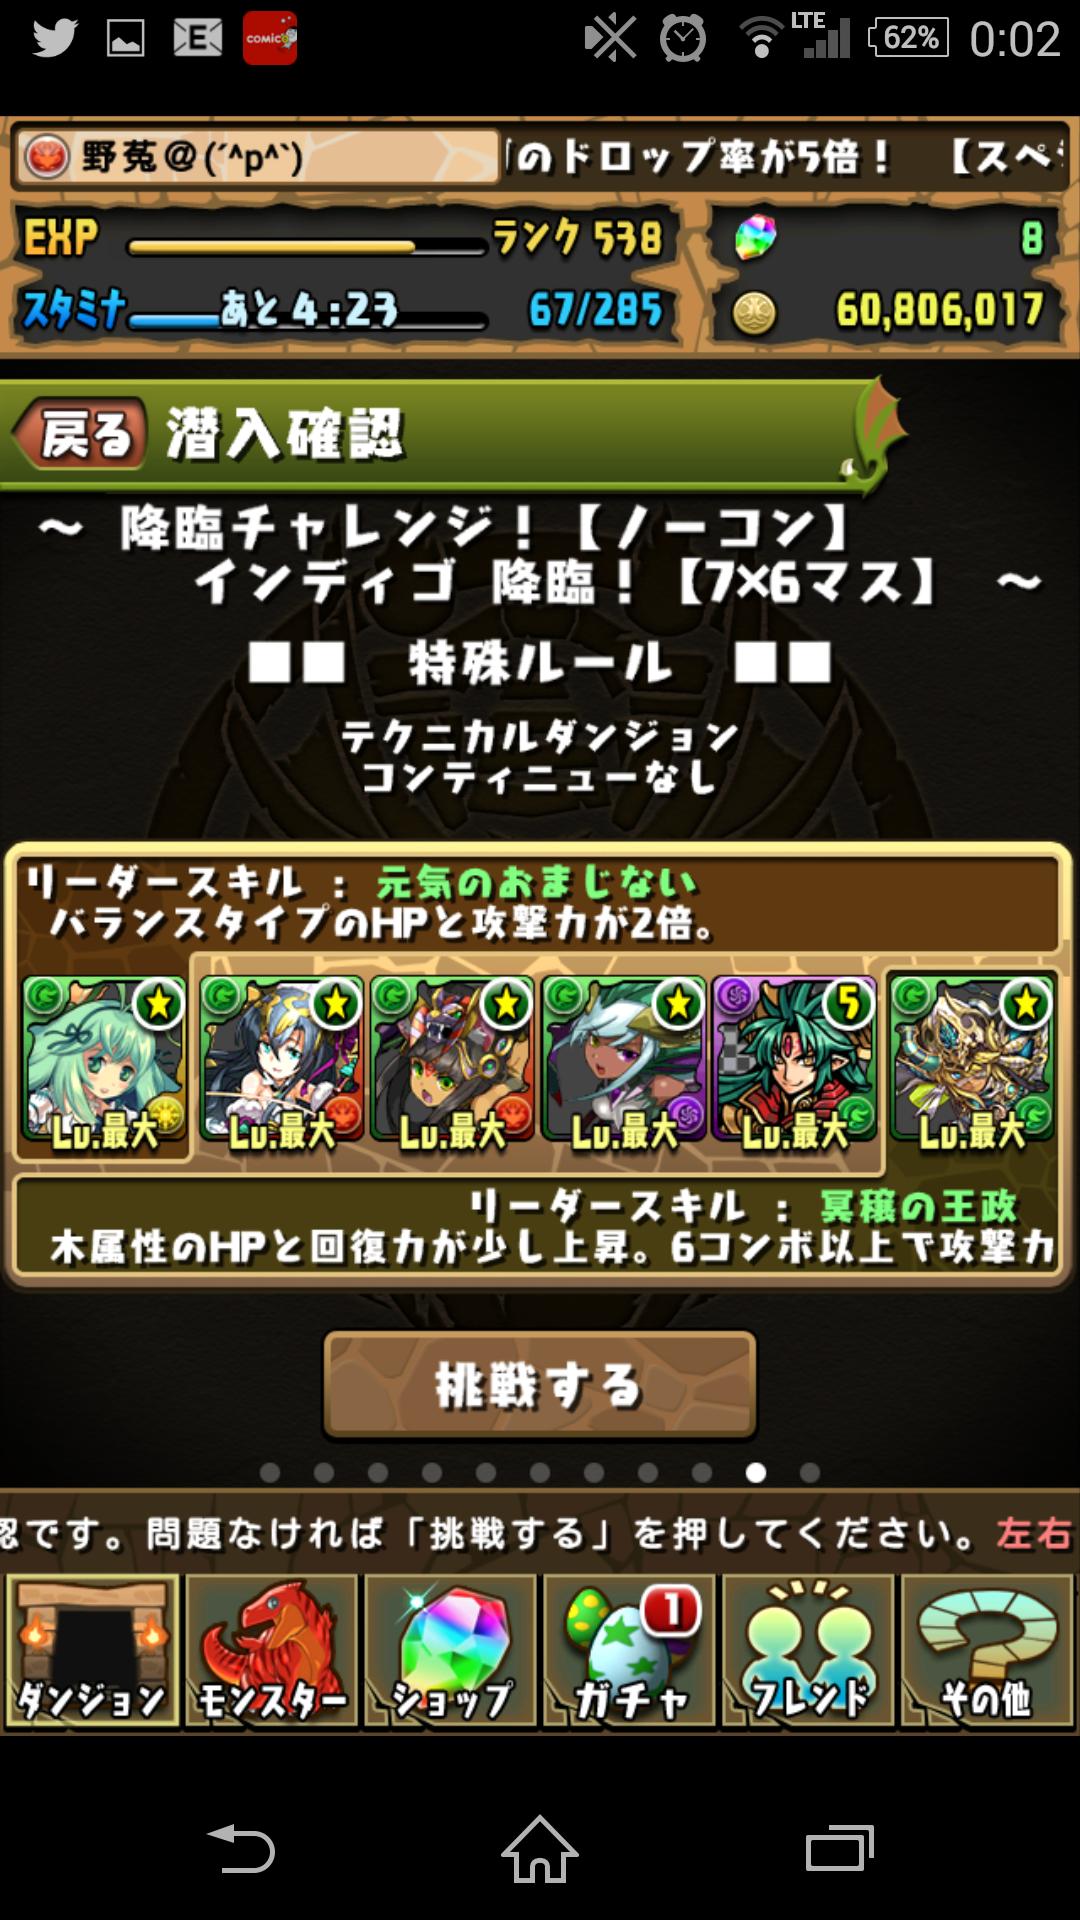 Screenshot_2015-11-26-00-02-50.png